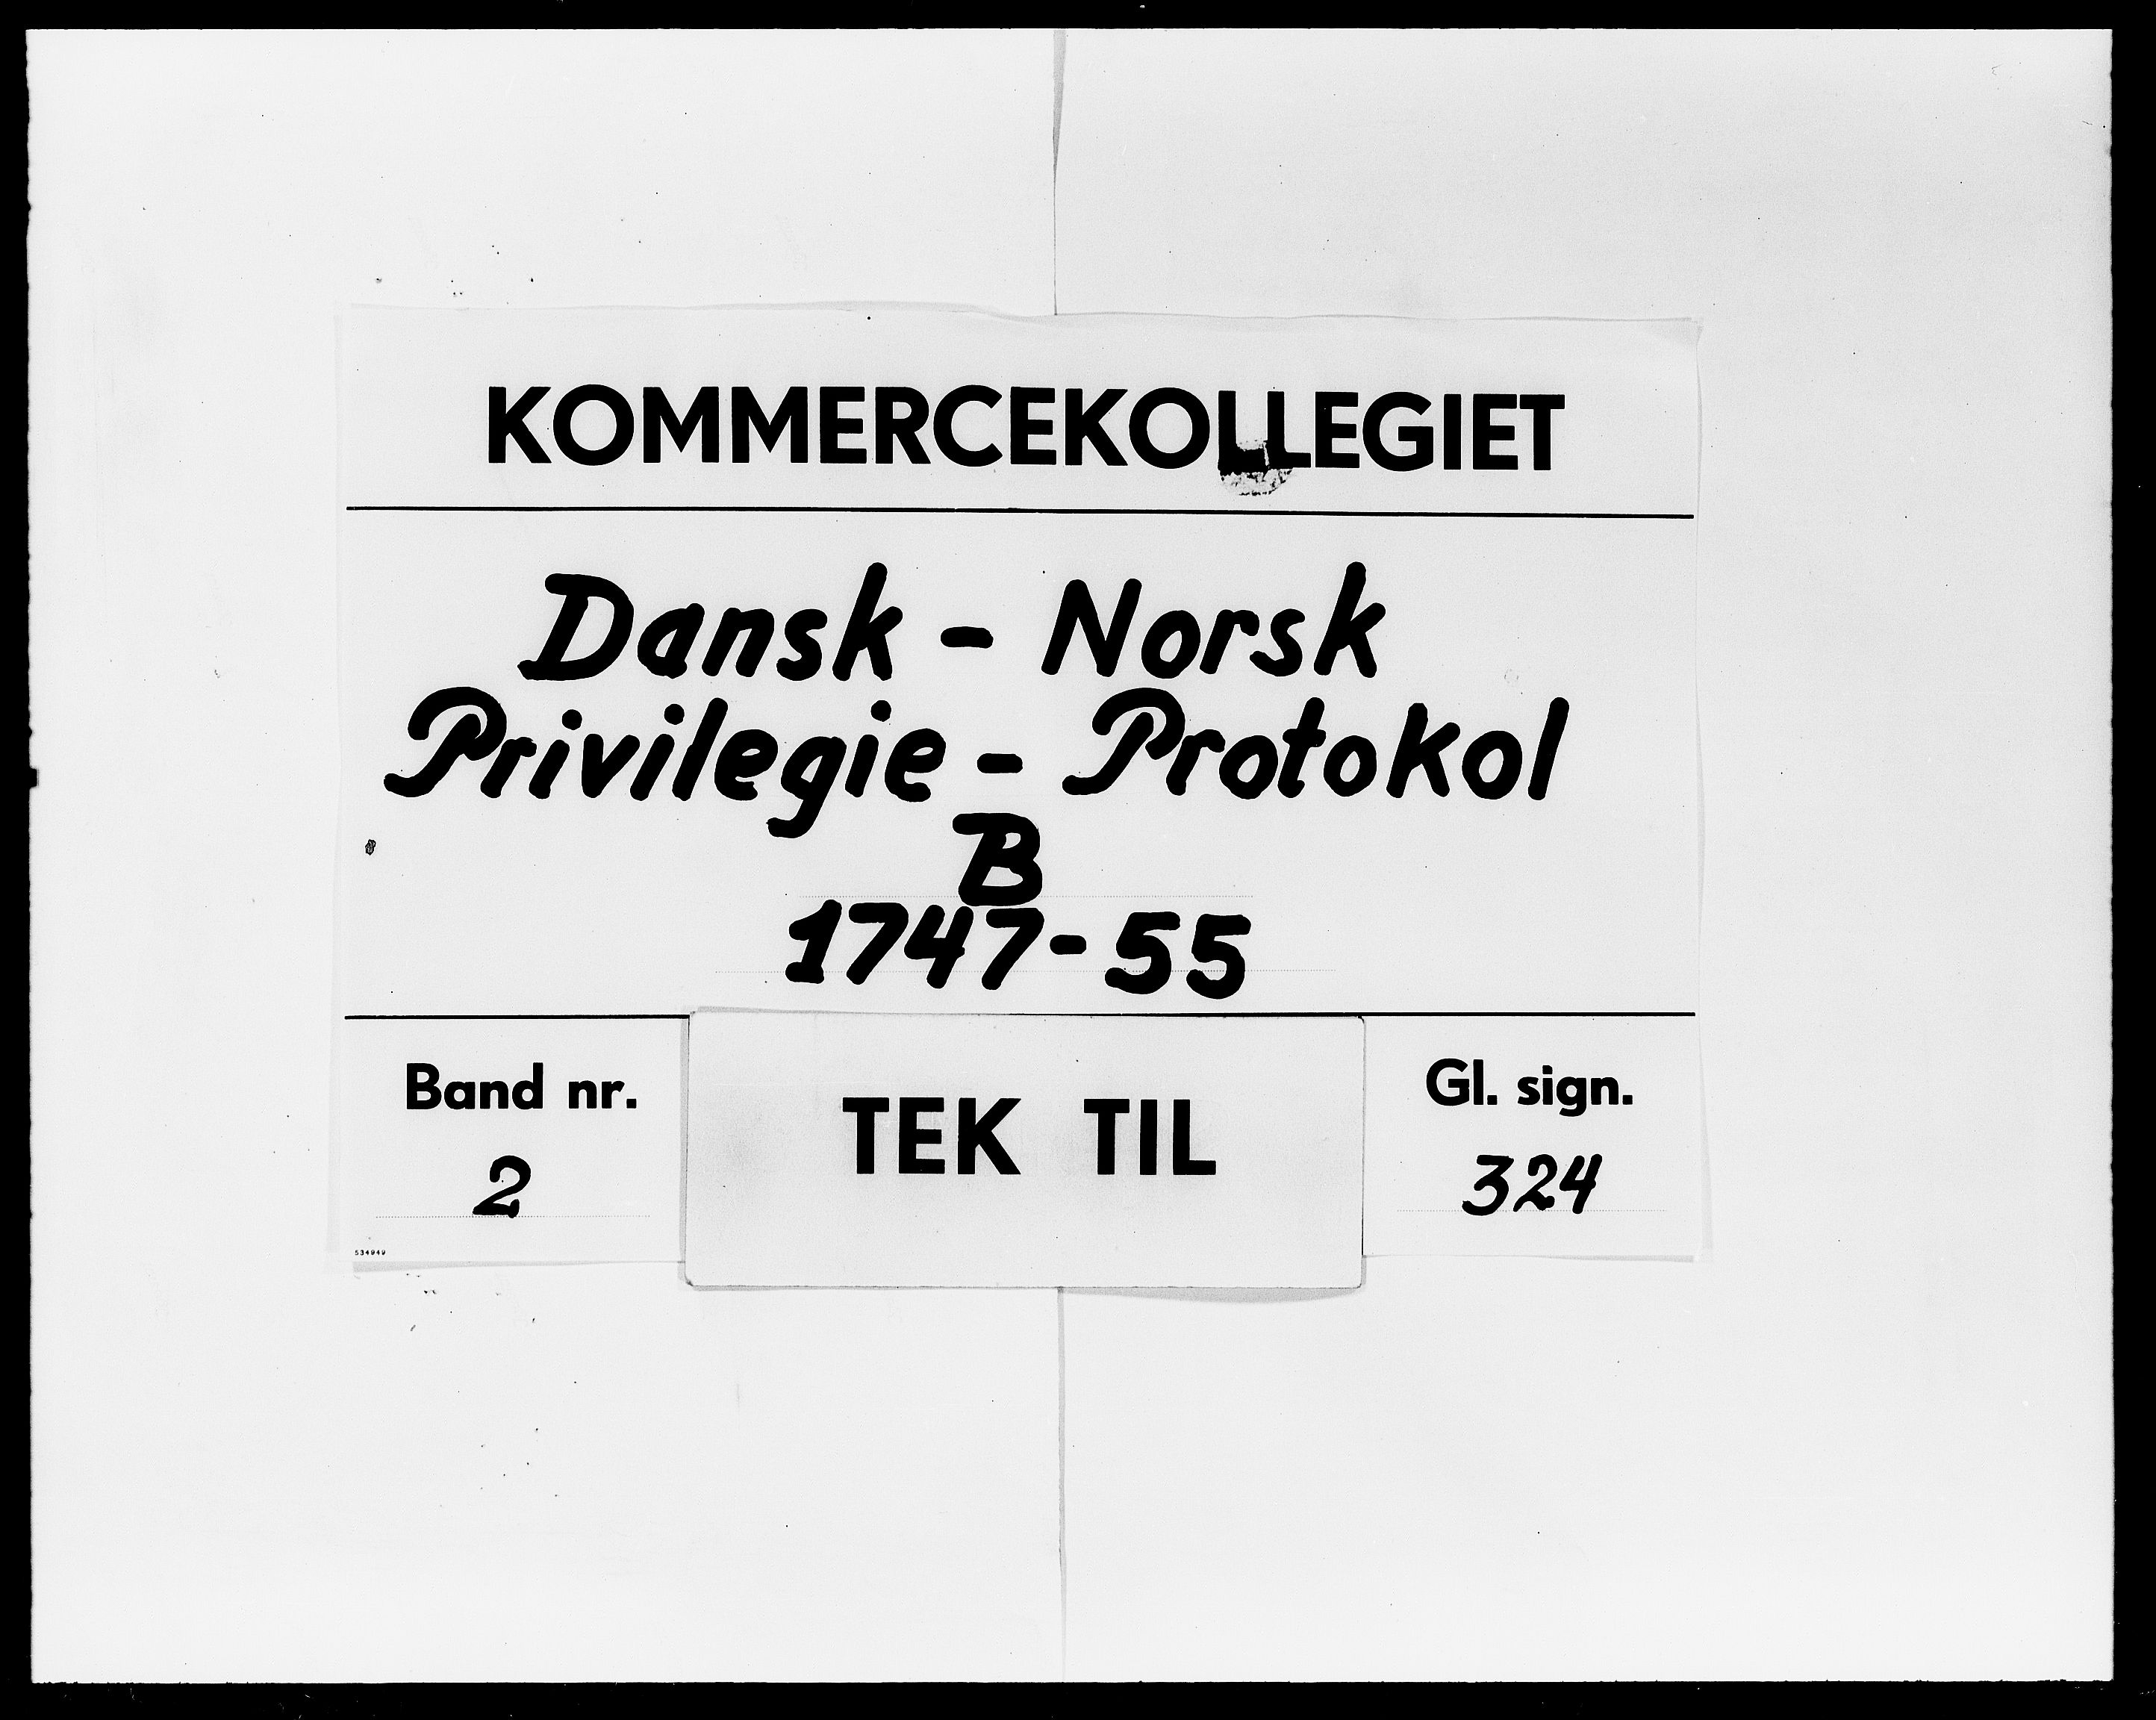 DRA, Kommercekollegiet, Dansk-Norske Sekretariat, -/21: Dansk-Norsk Privilegie-Protokol B, 1747-1755